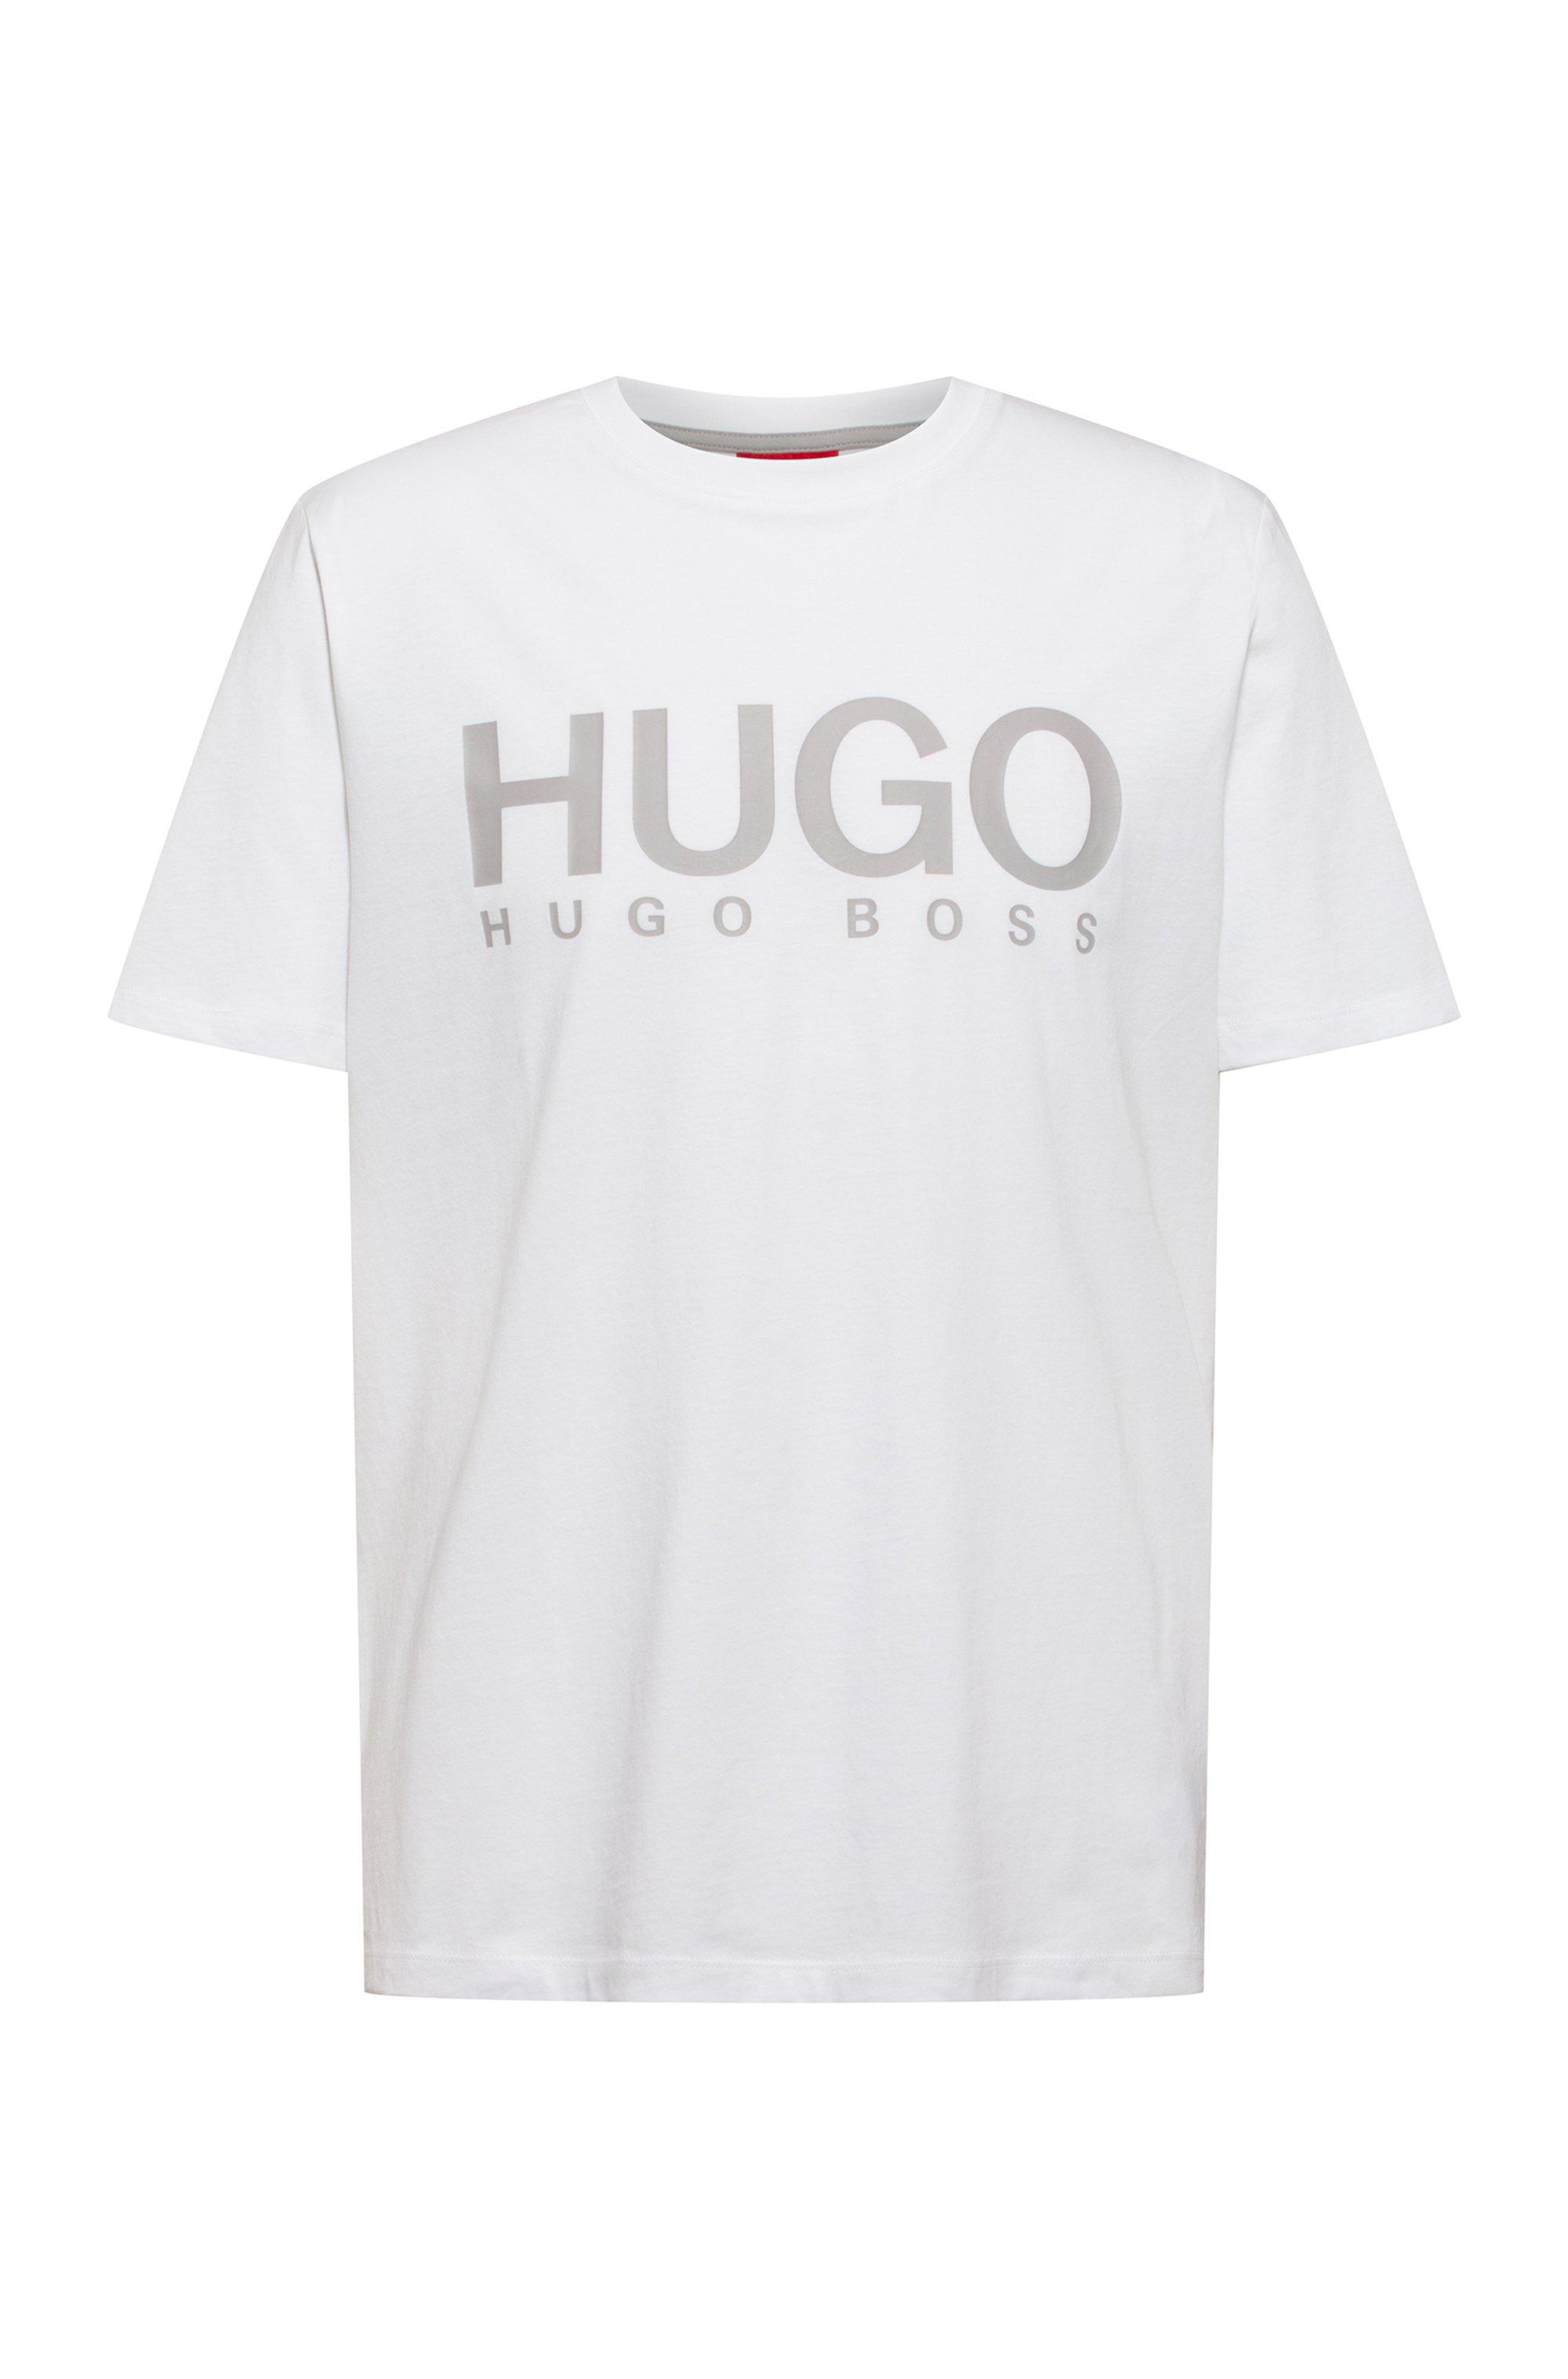 Logo-print crew-neck T-shirt in cotton jersey, White